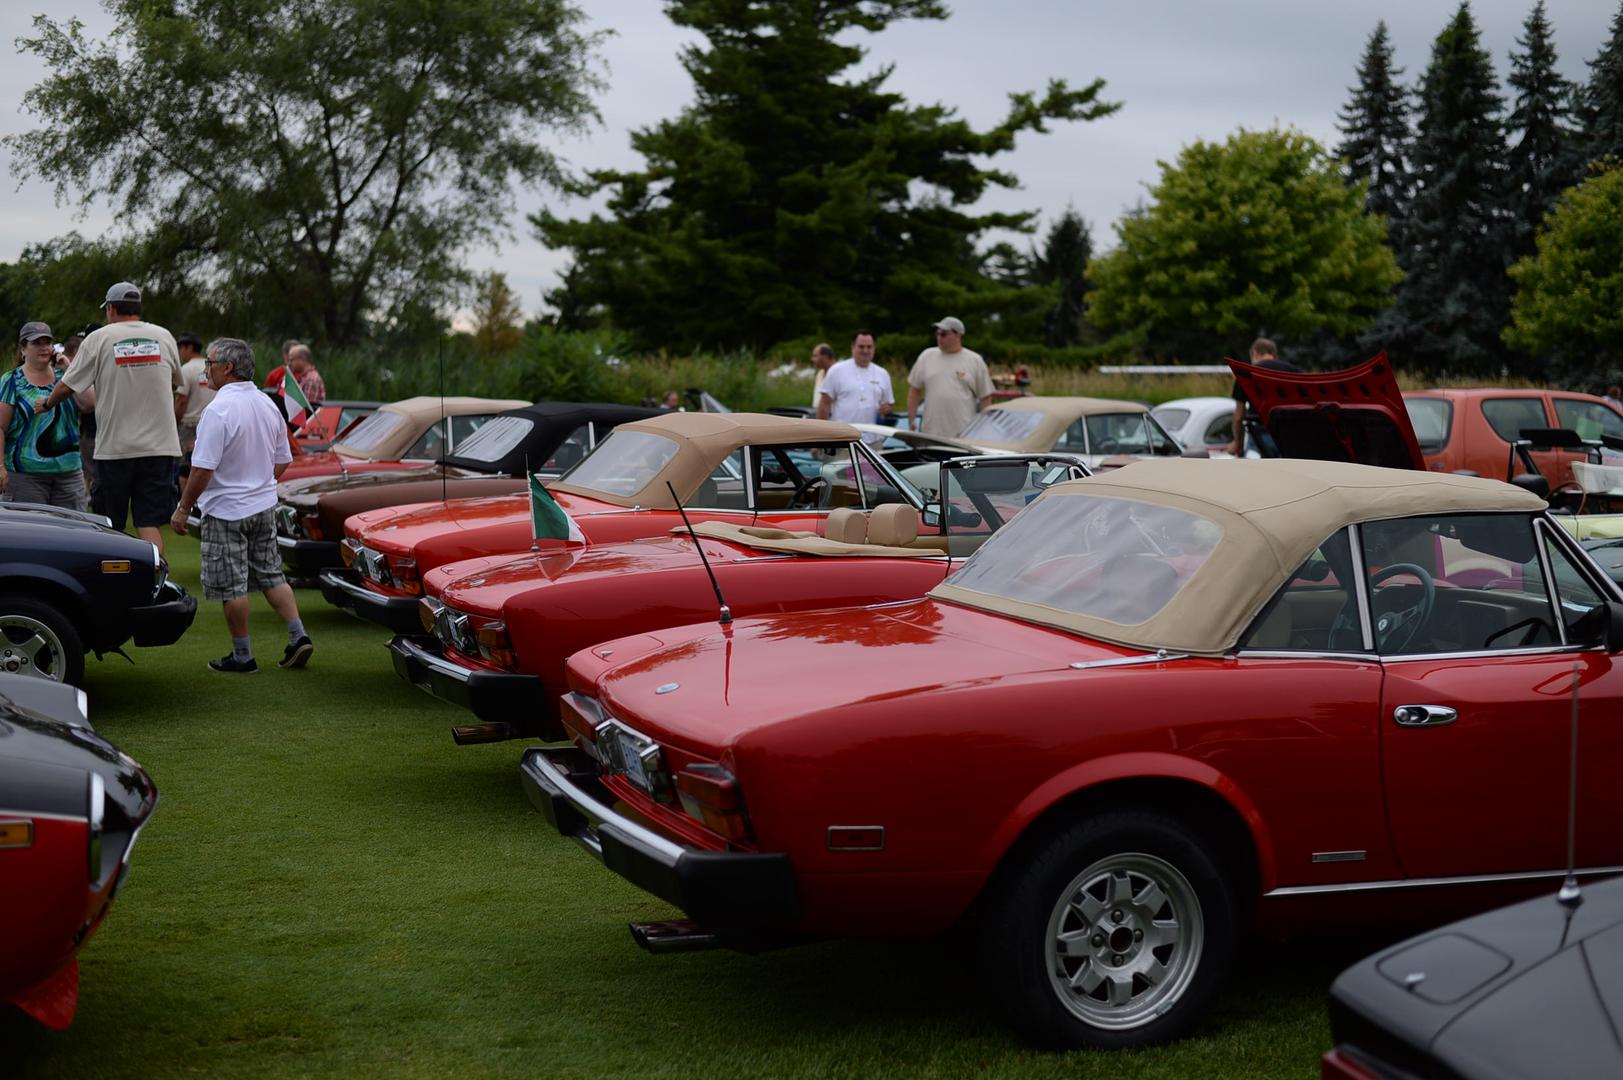 pininfarinaazzurra com - vintage car hobby site, information - history,  used vehicles